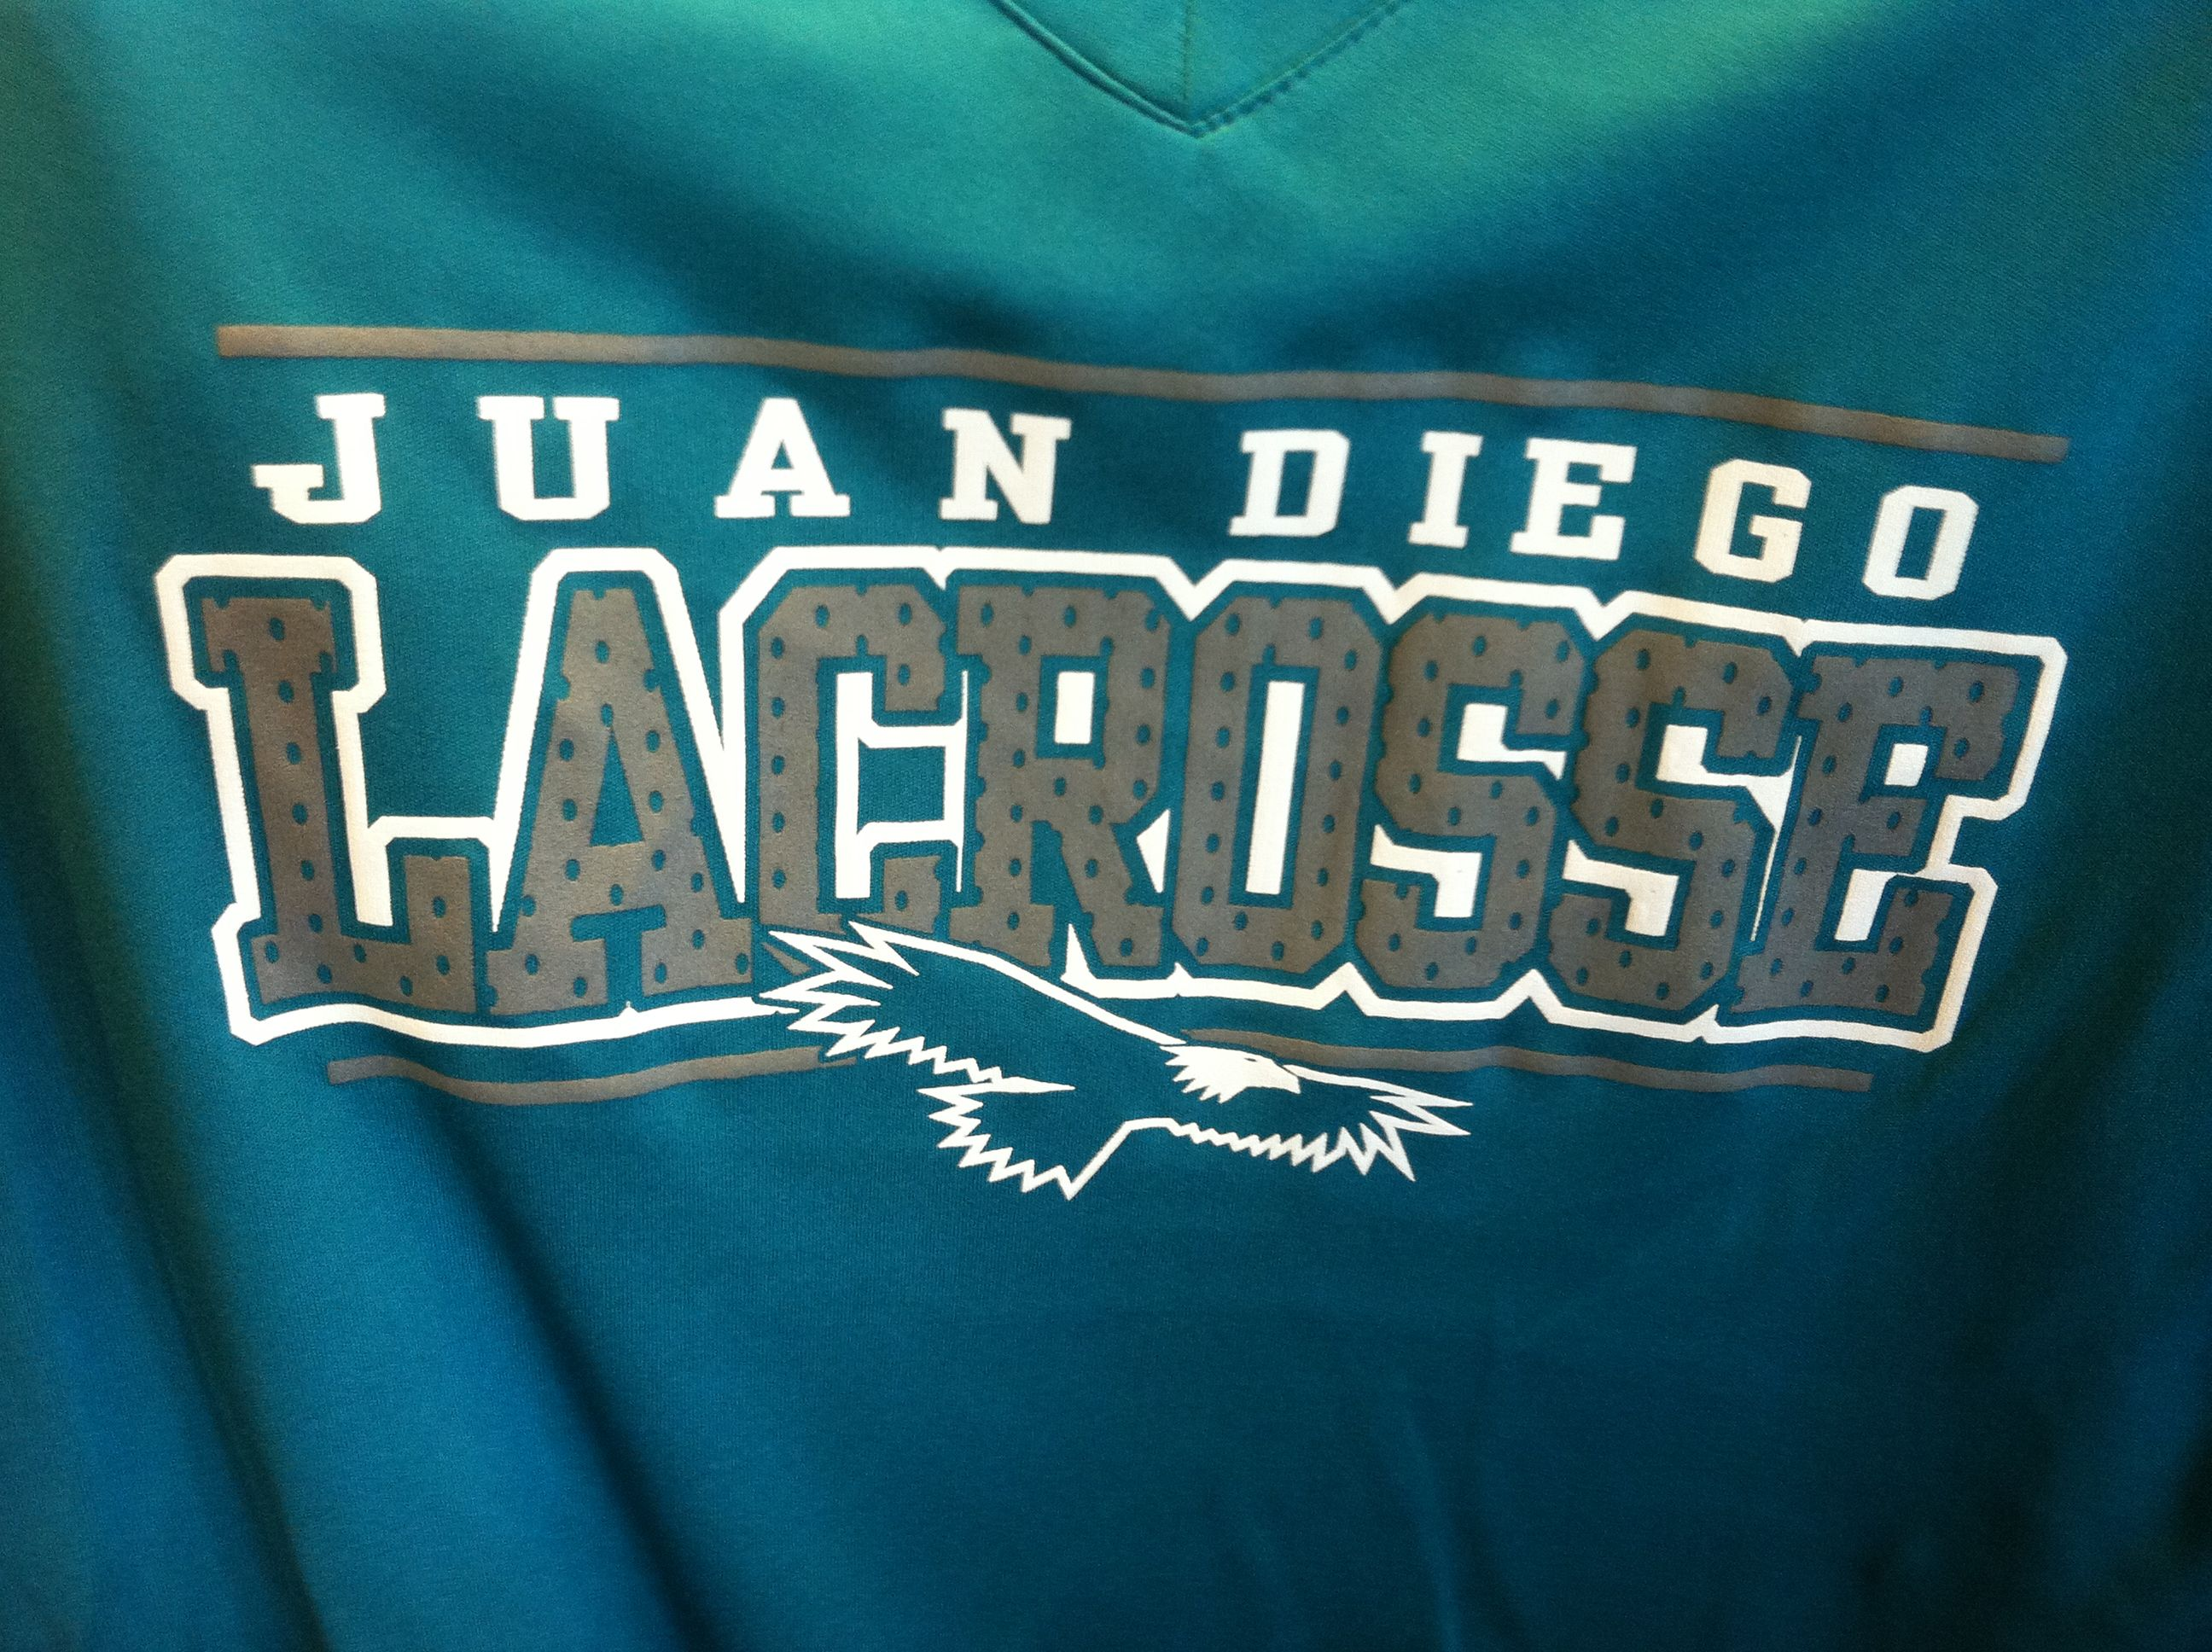 Shirt hoodie design - Lacrosse T Shirt Jersey And Hoodie Design Idea Jd High School